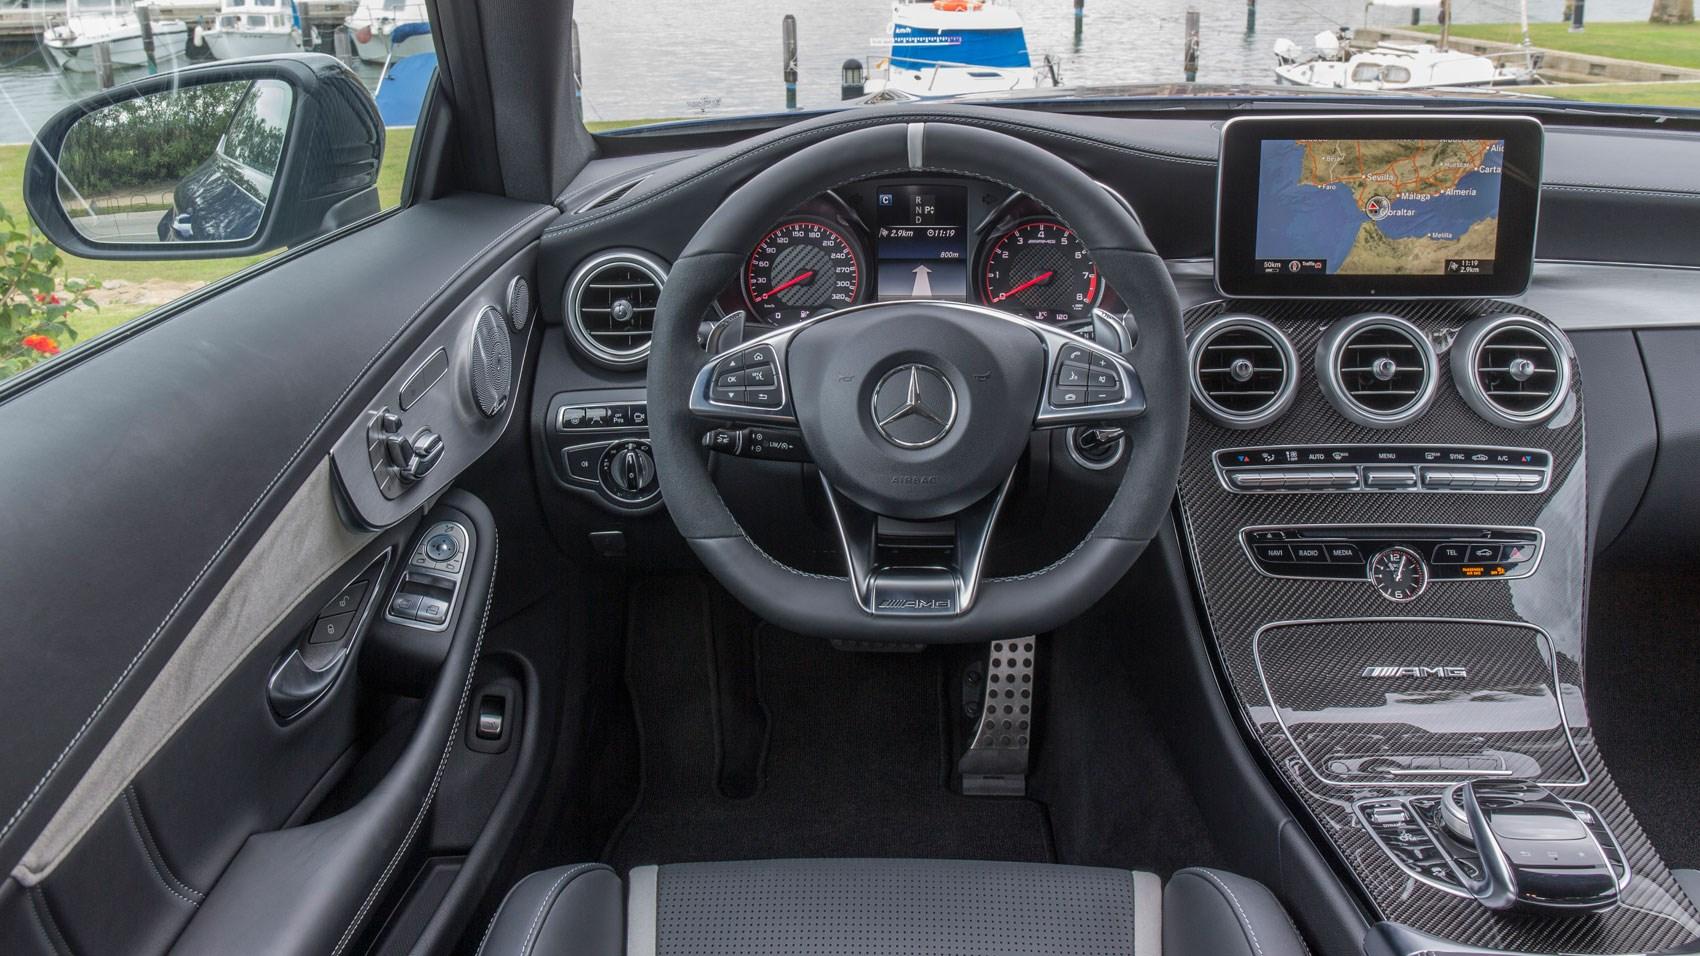 Mercedes Benz Lease Deals 0 Down >> Mercedes-AMG C63 S Coupe (2015) review | CAR Magazine